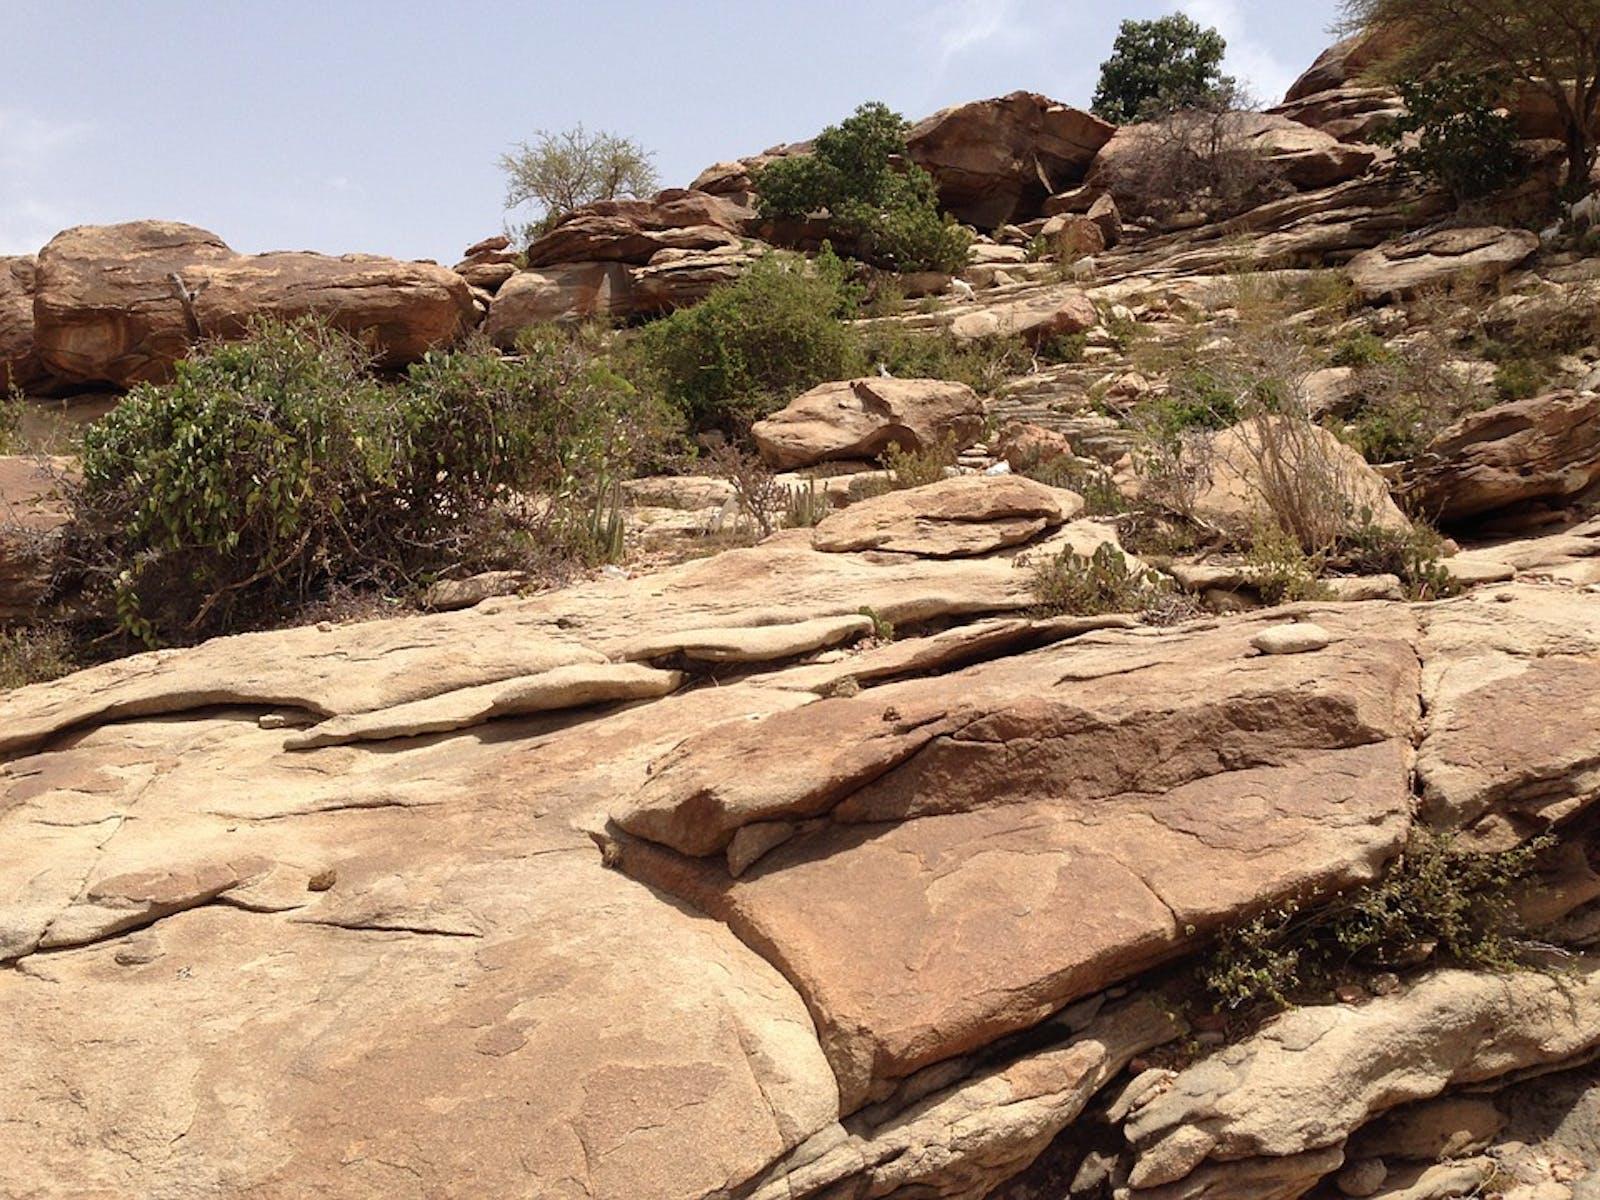 Horn of Africa Xeric Bushlands